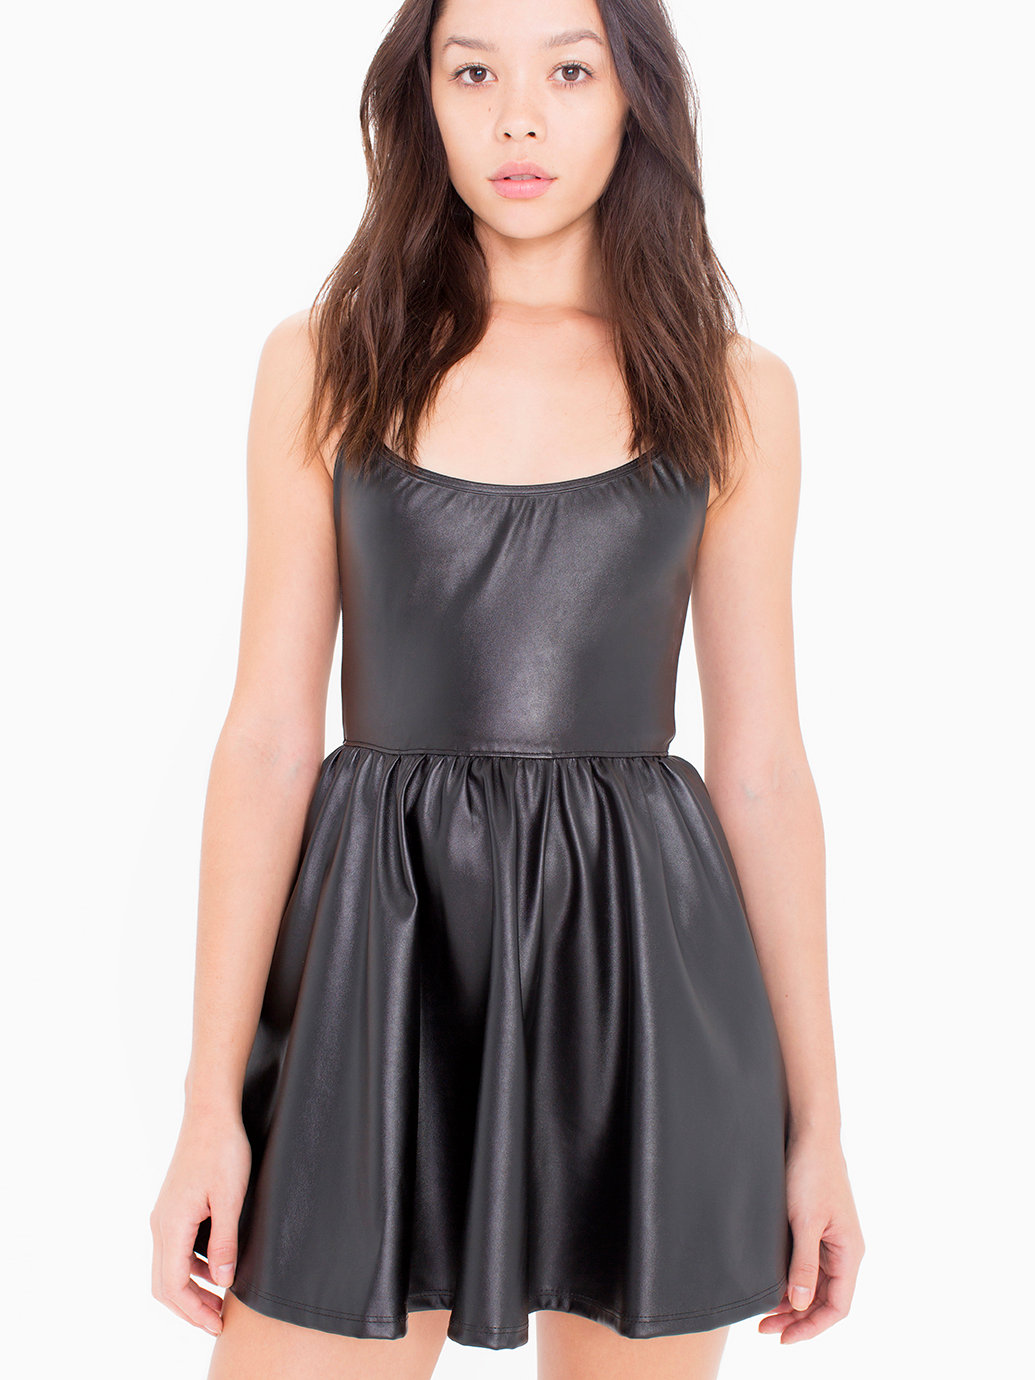 Leather dress 2017